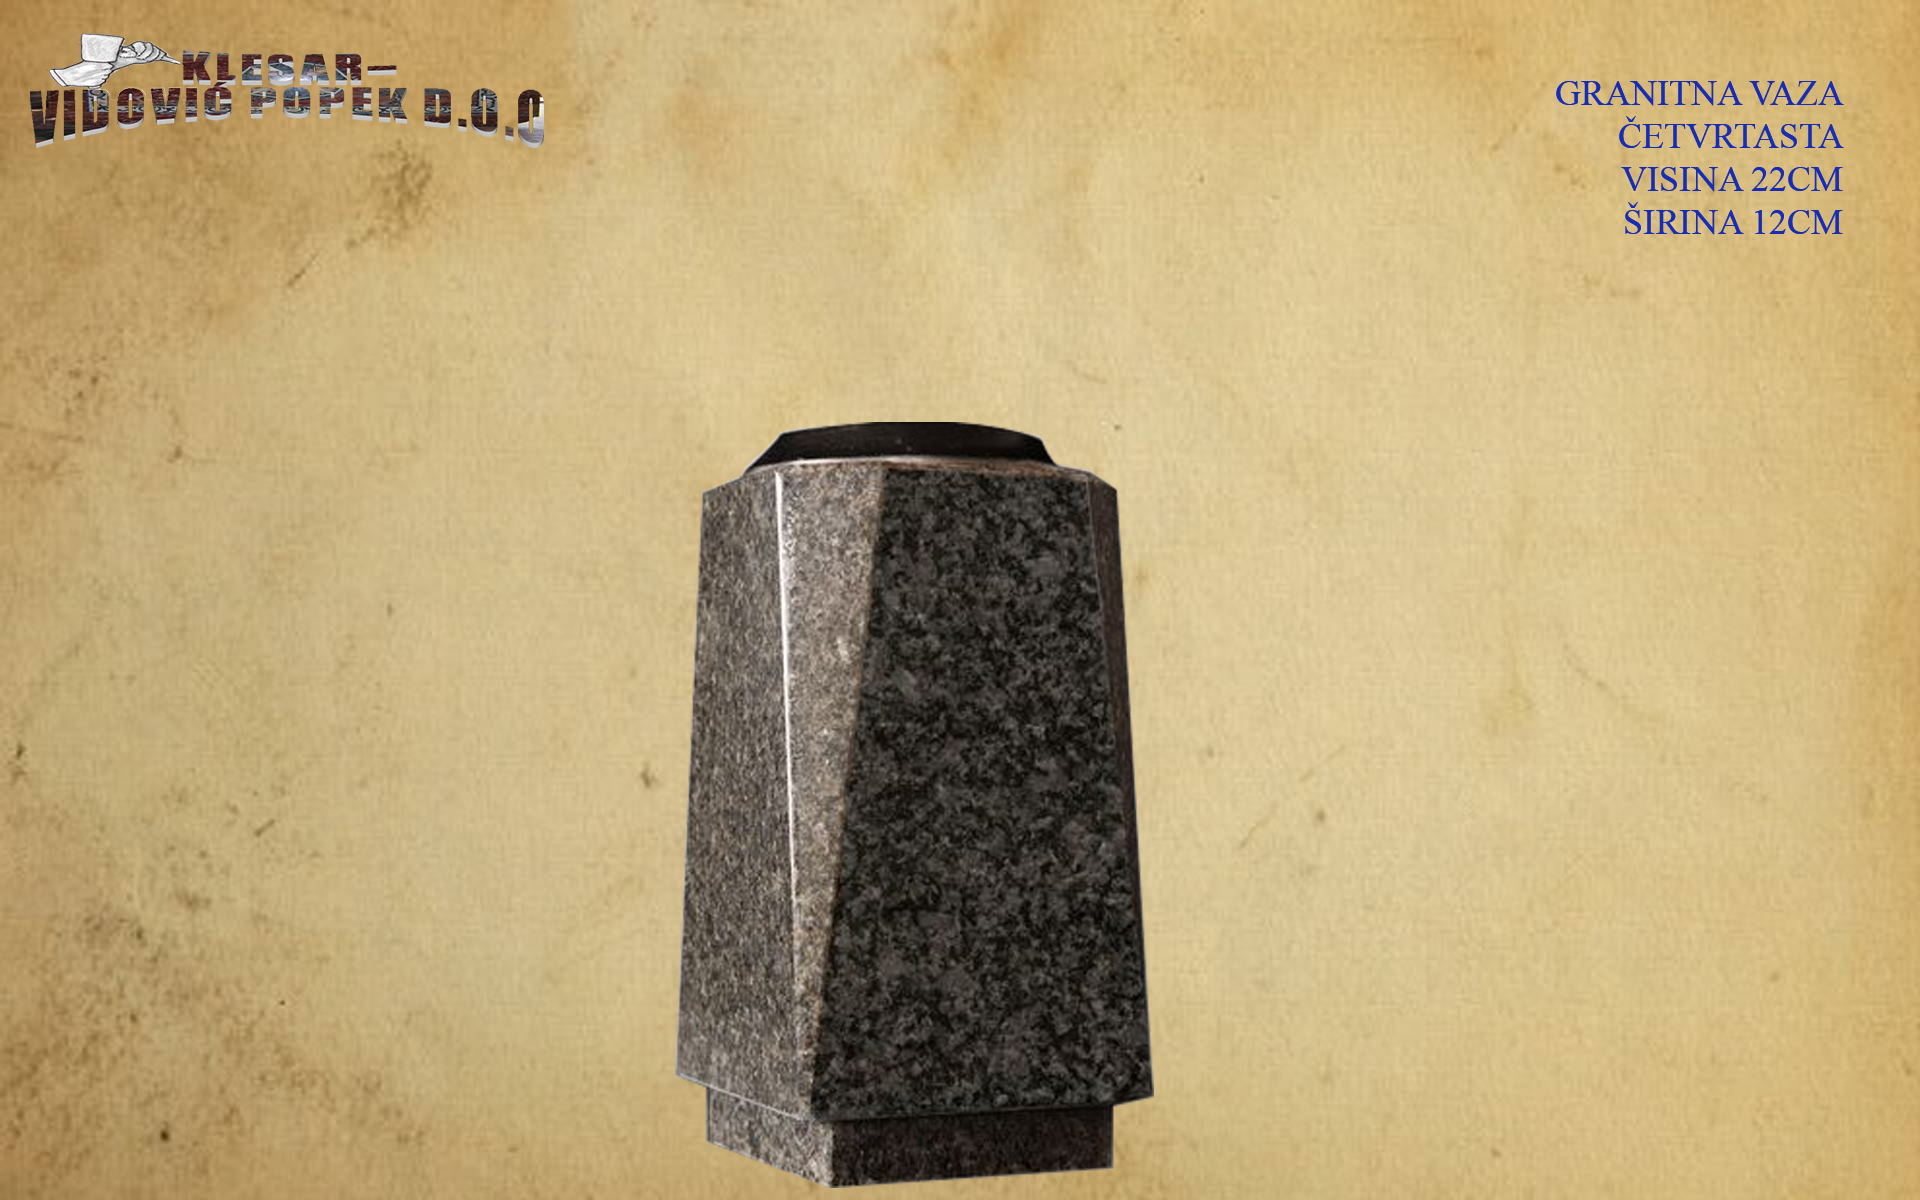 vaza-cetvrtasta1.jpg